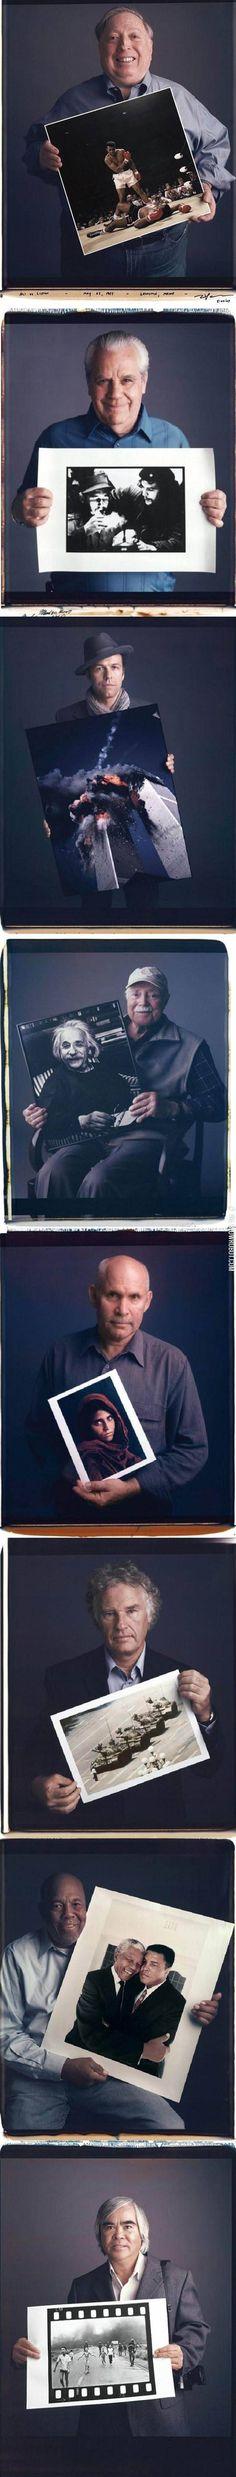 JOJO POST ART: The photographers behind the photographs.